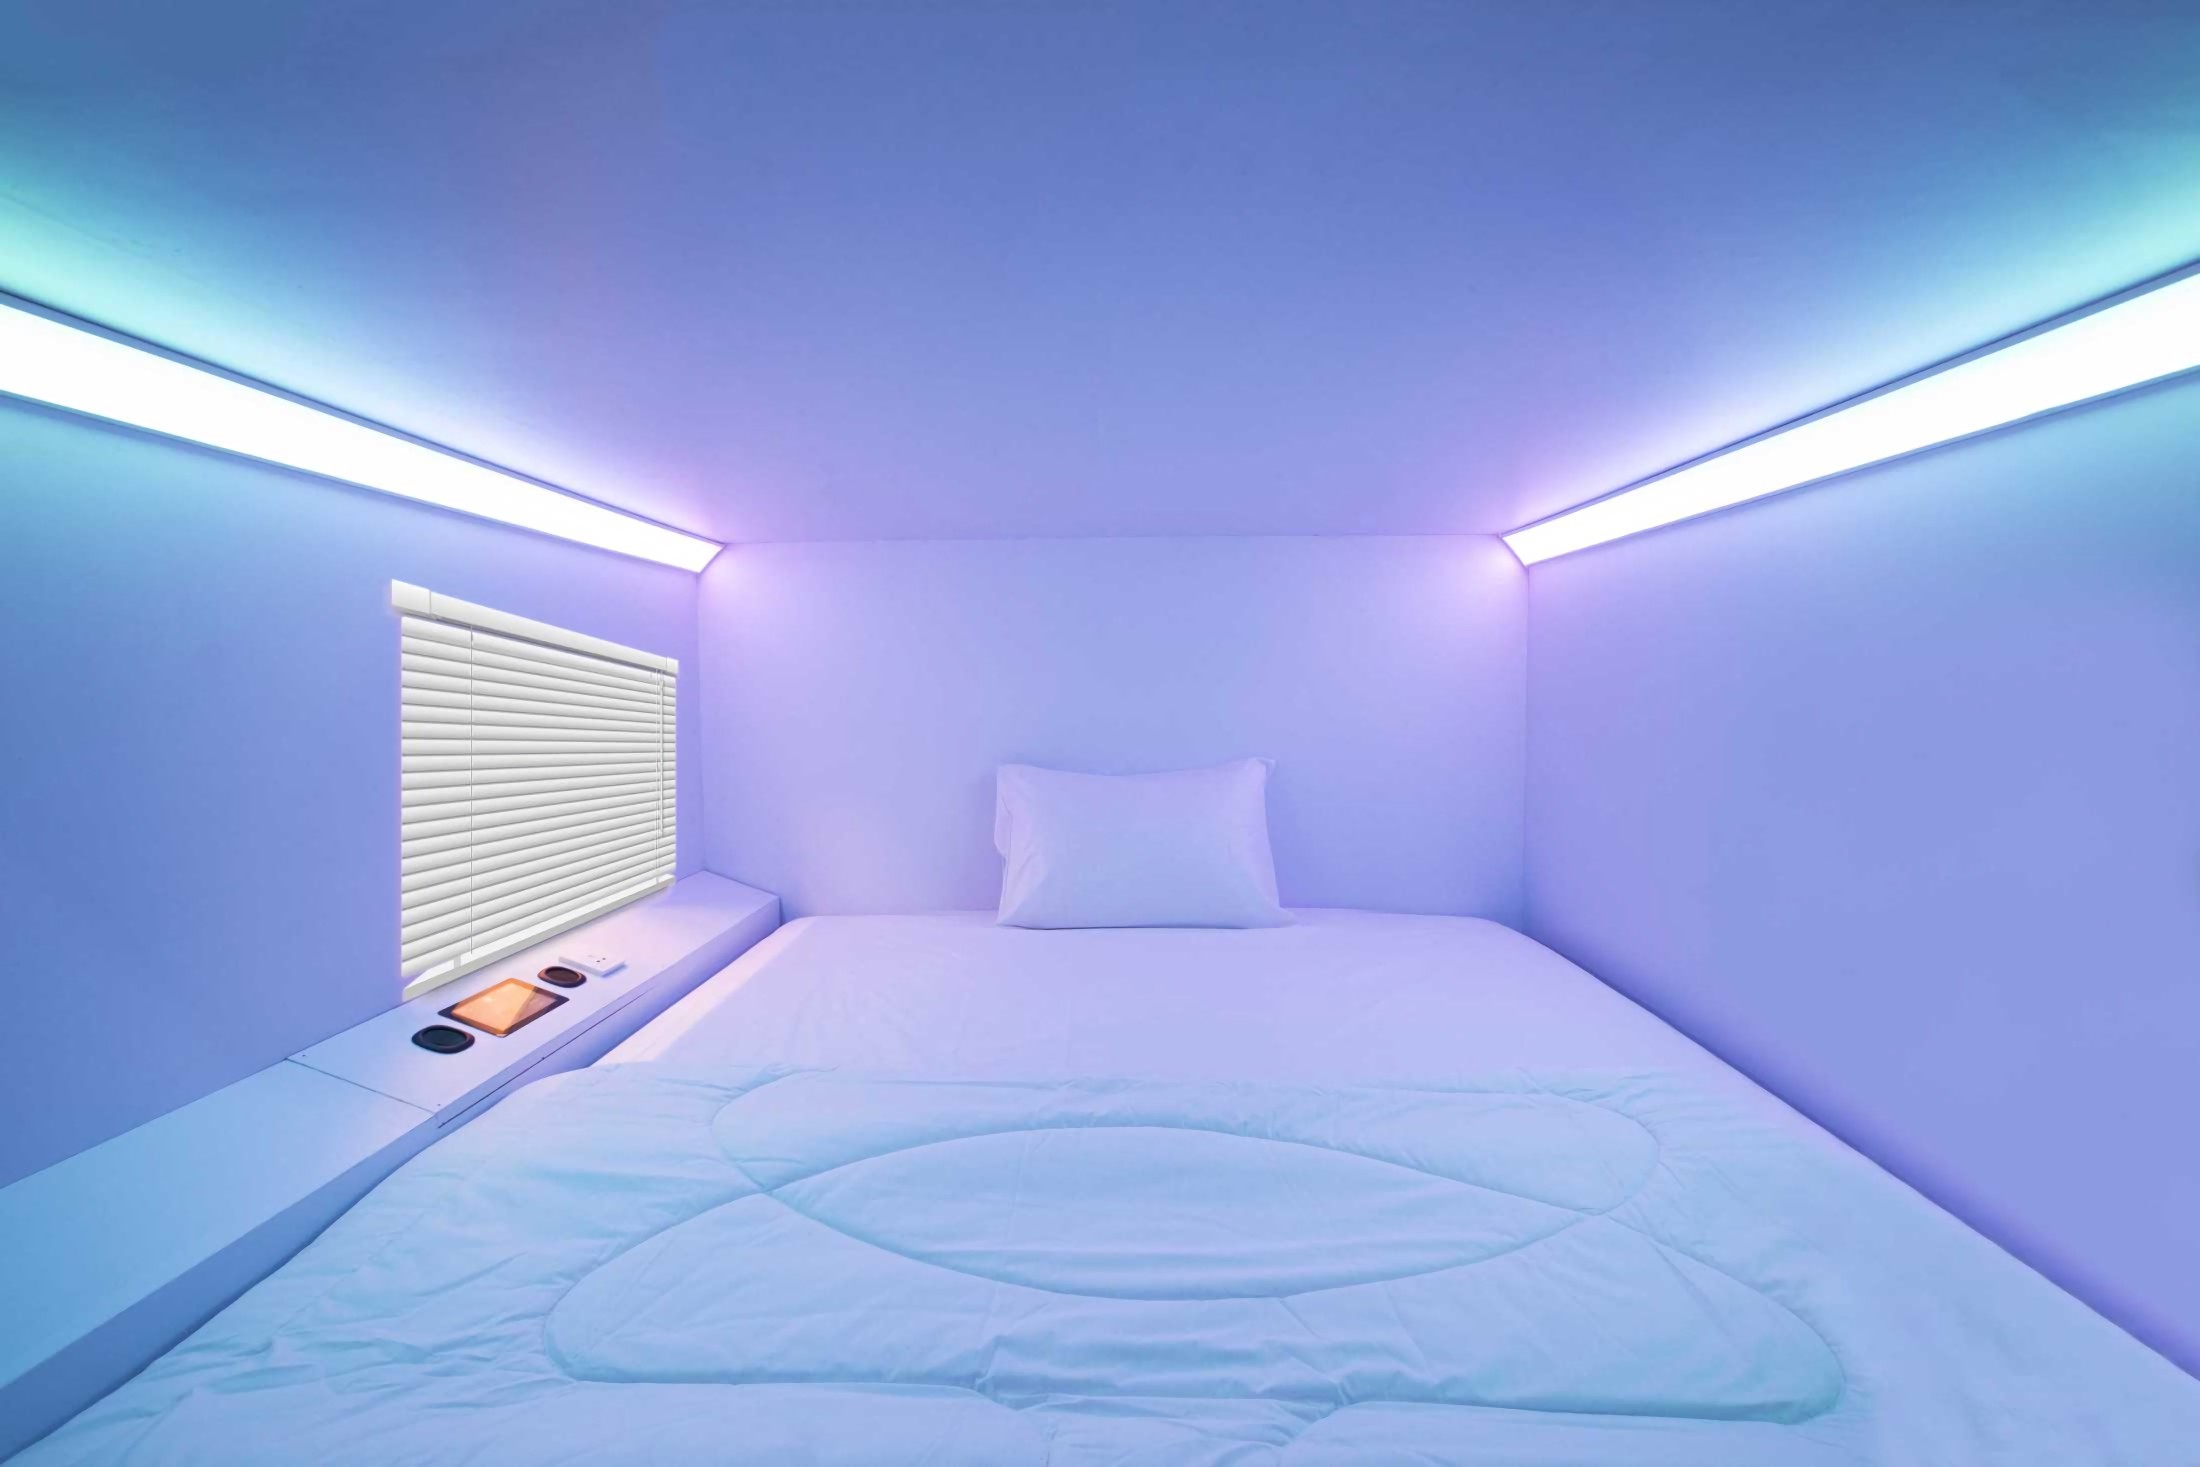 Desain hotel dengan gaya dan pengalaman futuristik (Sumber: arsitag.com)